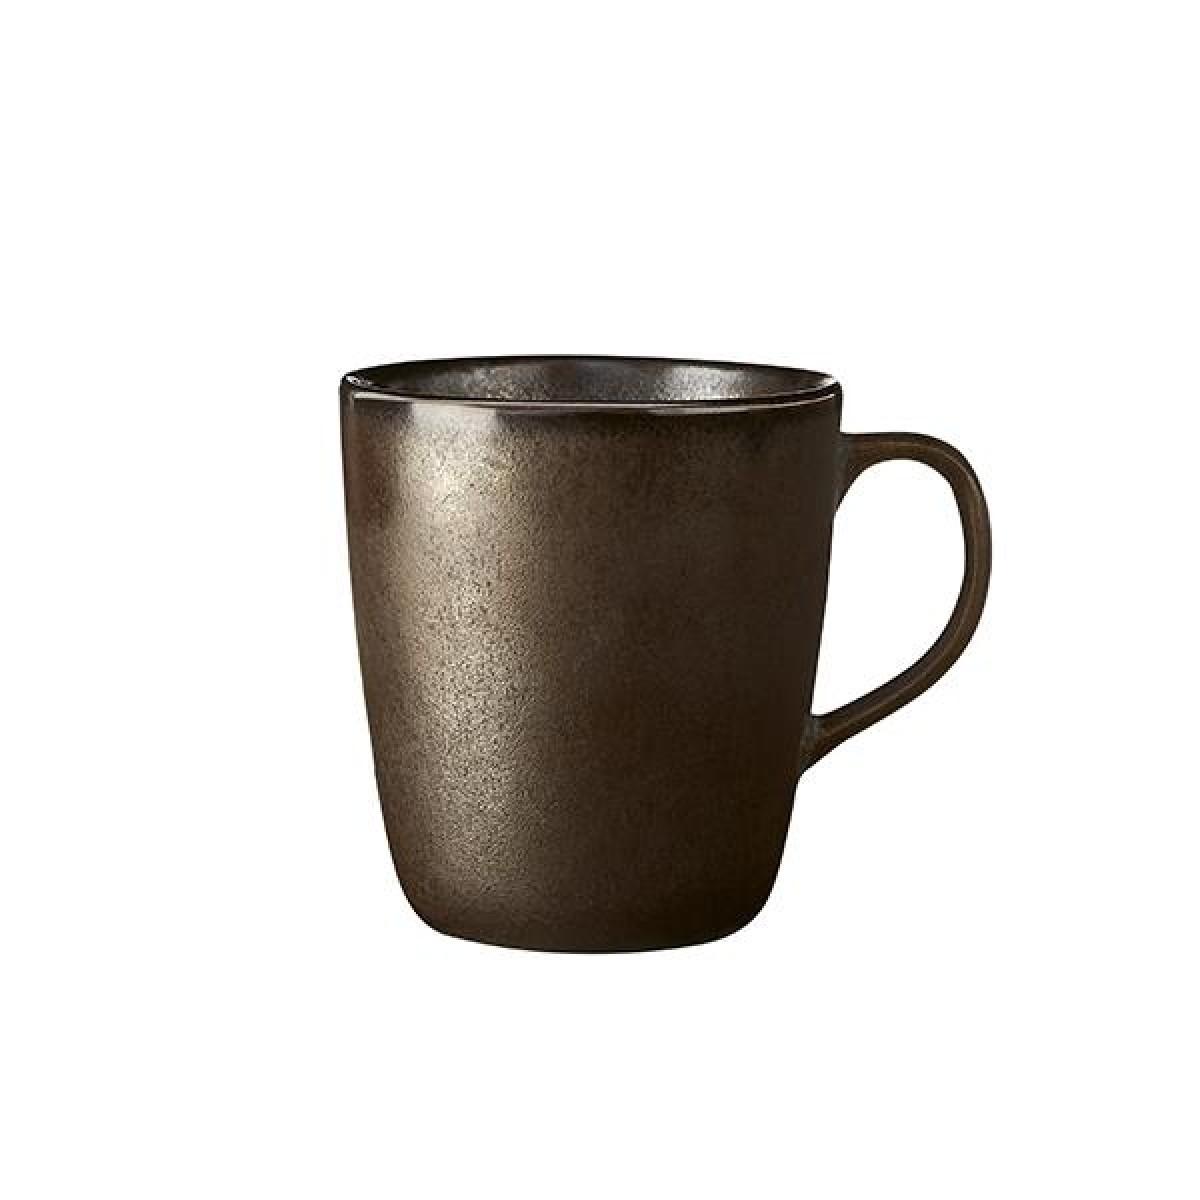 AIDA Raw krus m. hank 30 cl - metallic brown